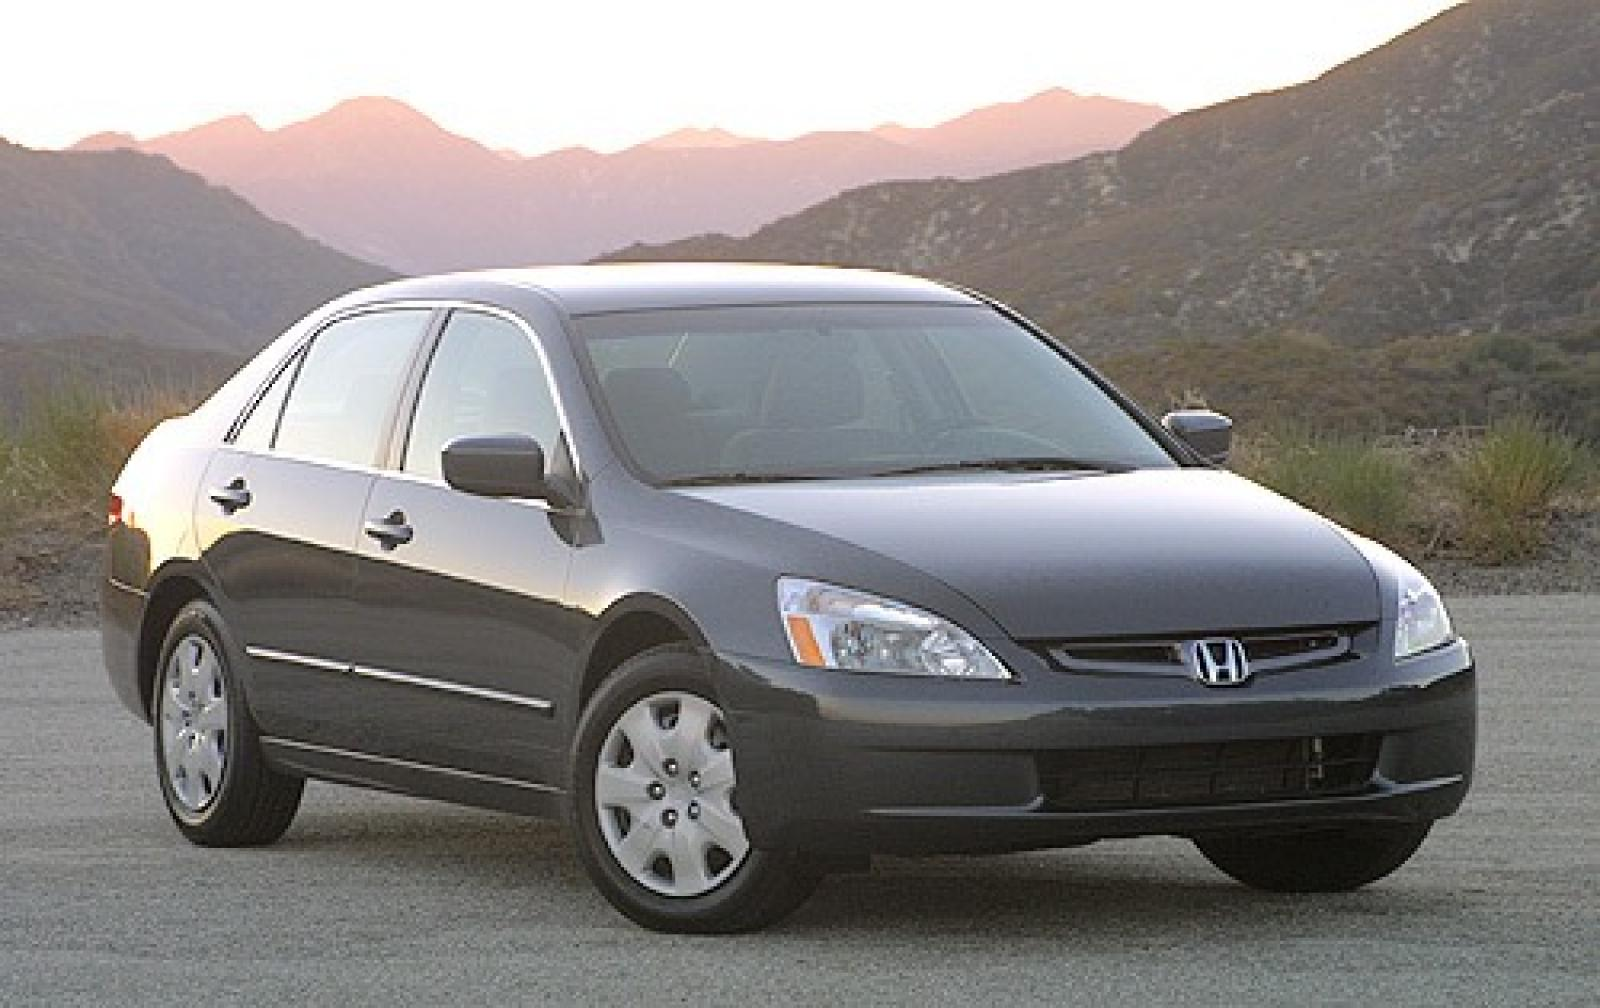 800 1024 1280 1600 Origin 2005 Honda Accord ...